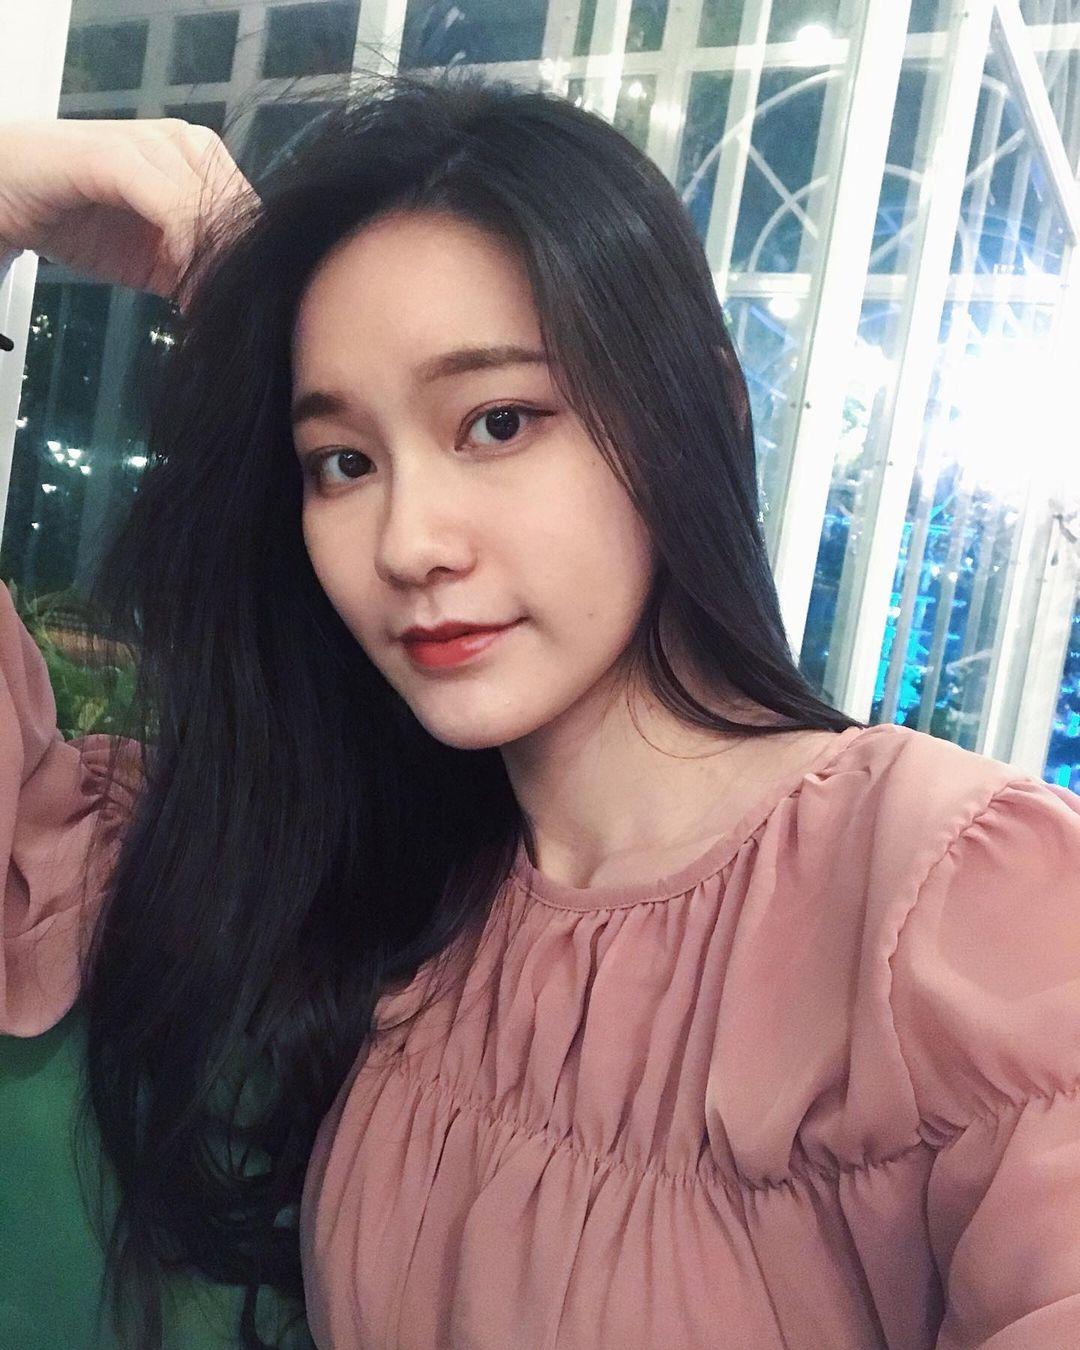 楊心瑩 Dati